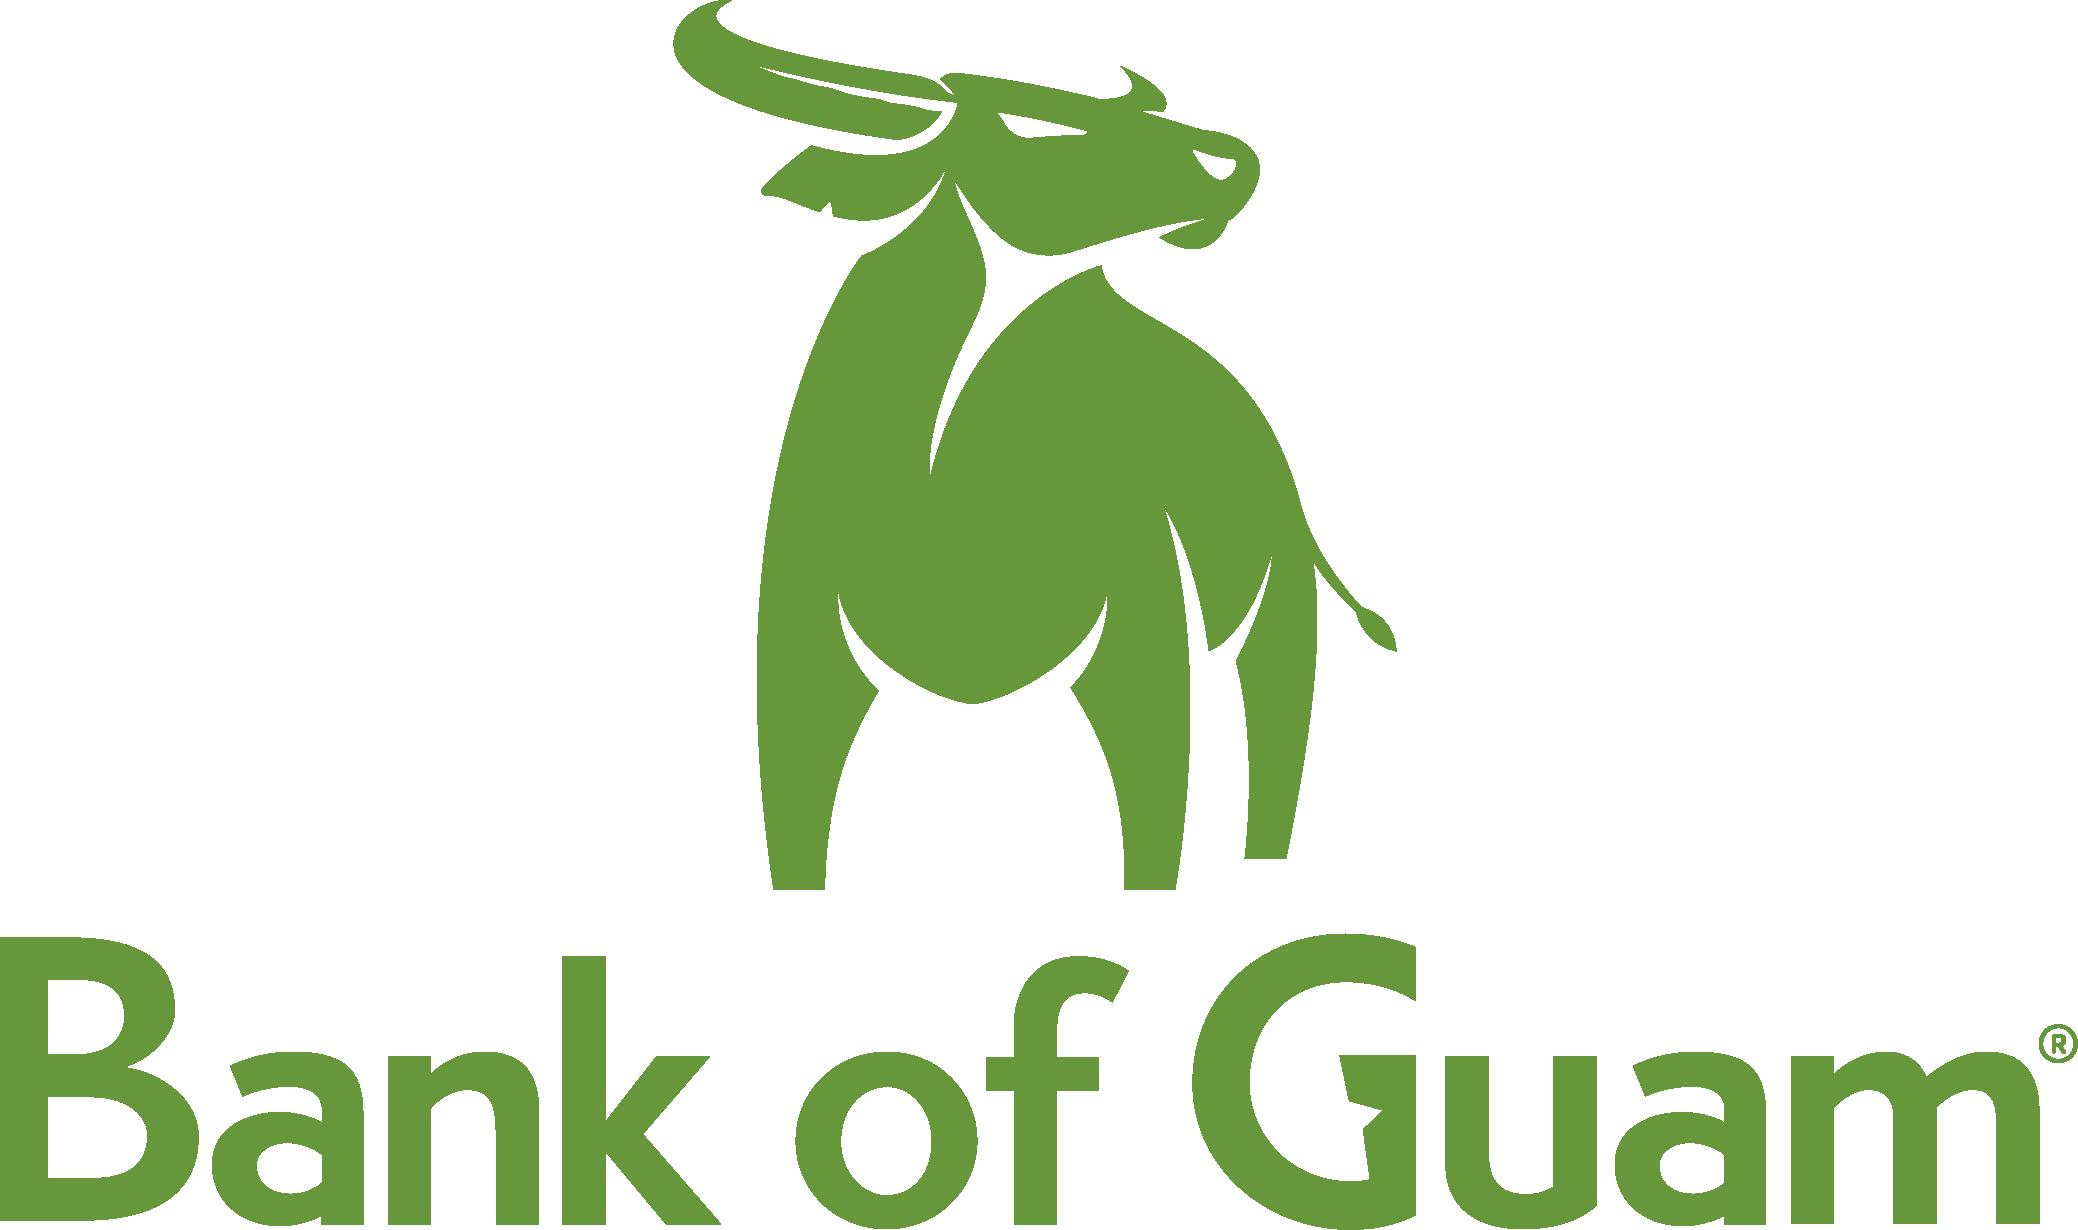 Bnk of Guam Icon & Logotype 01 vrtl (PMS 576).png